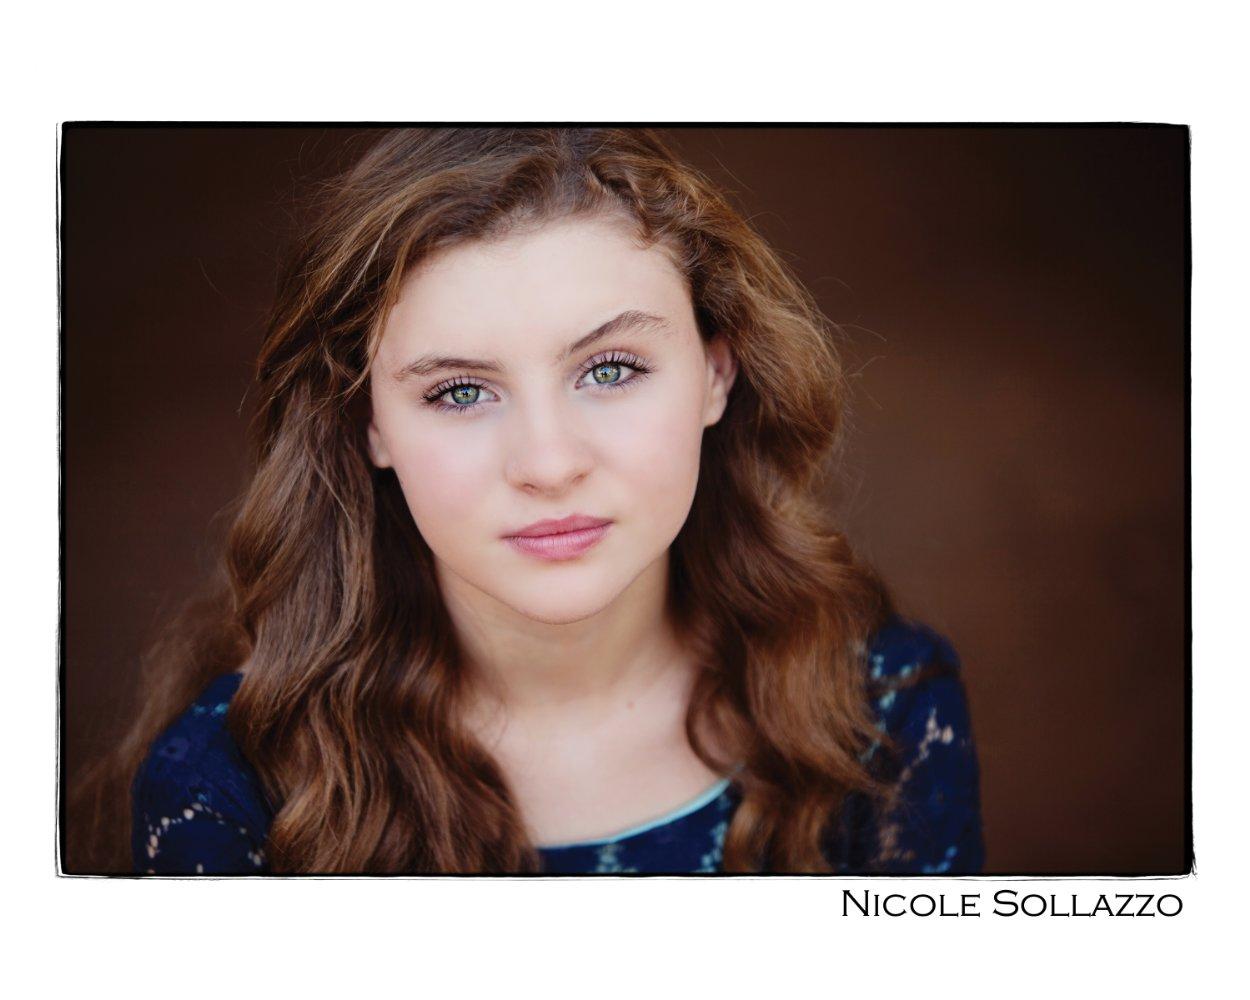 Nicole Sollazzo